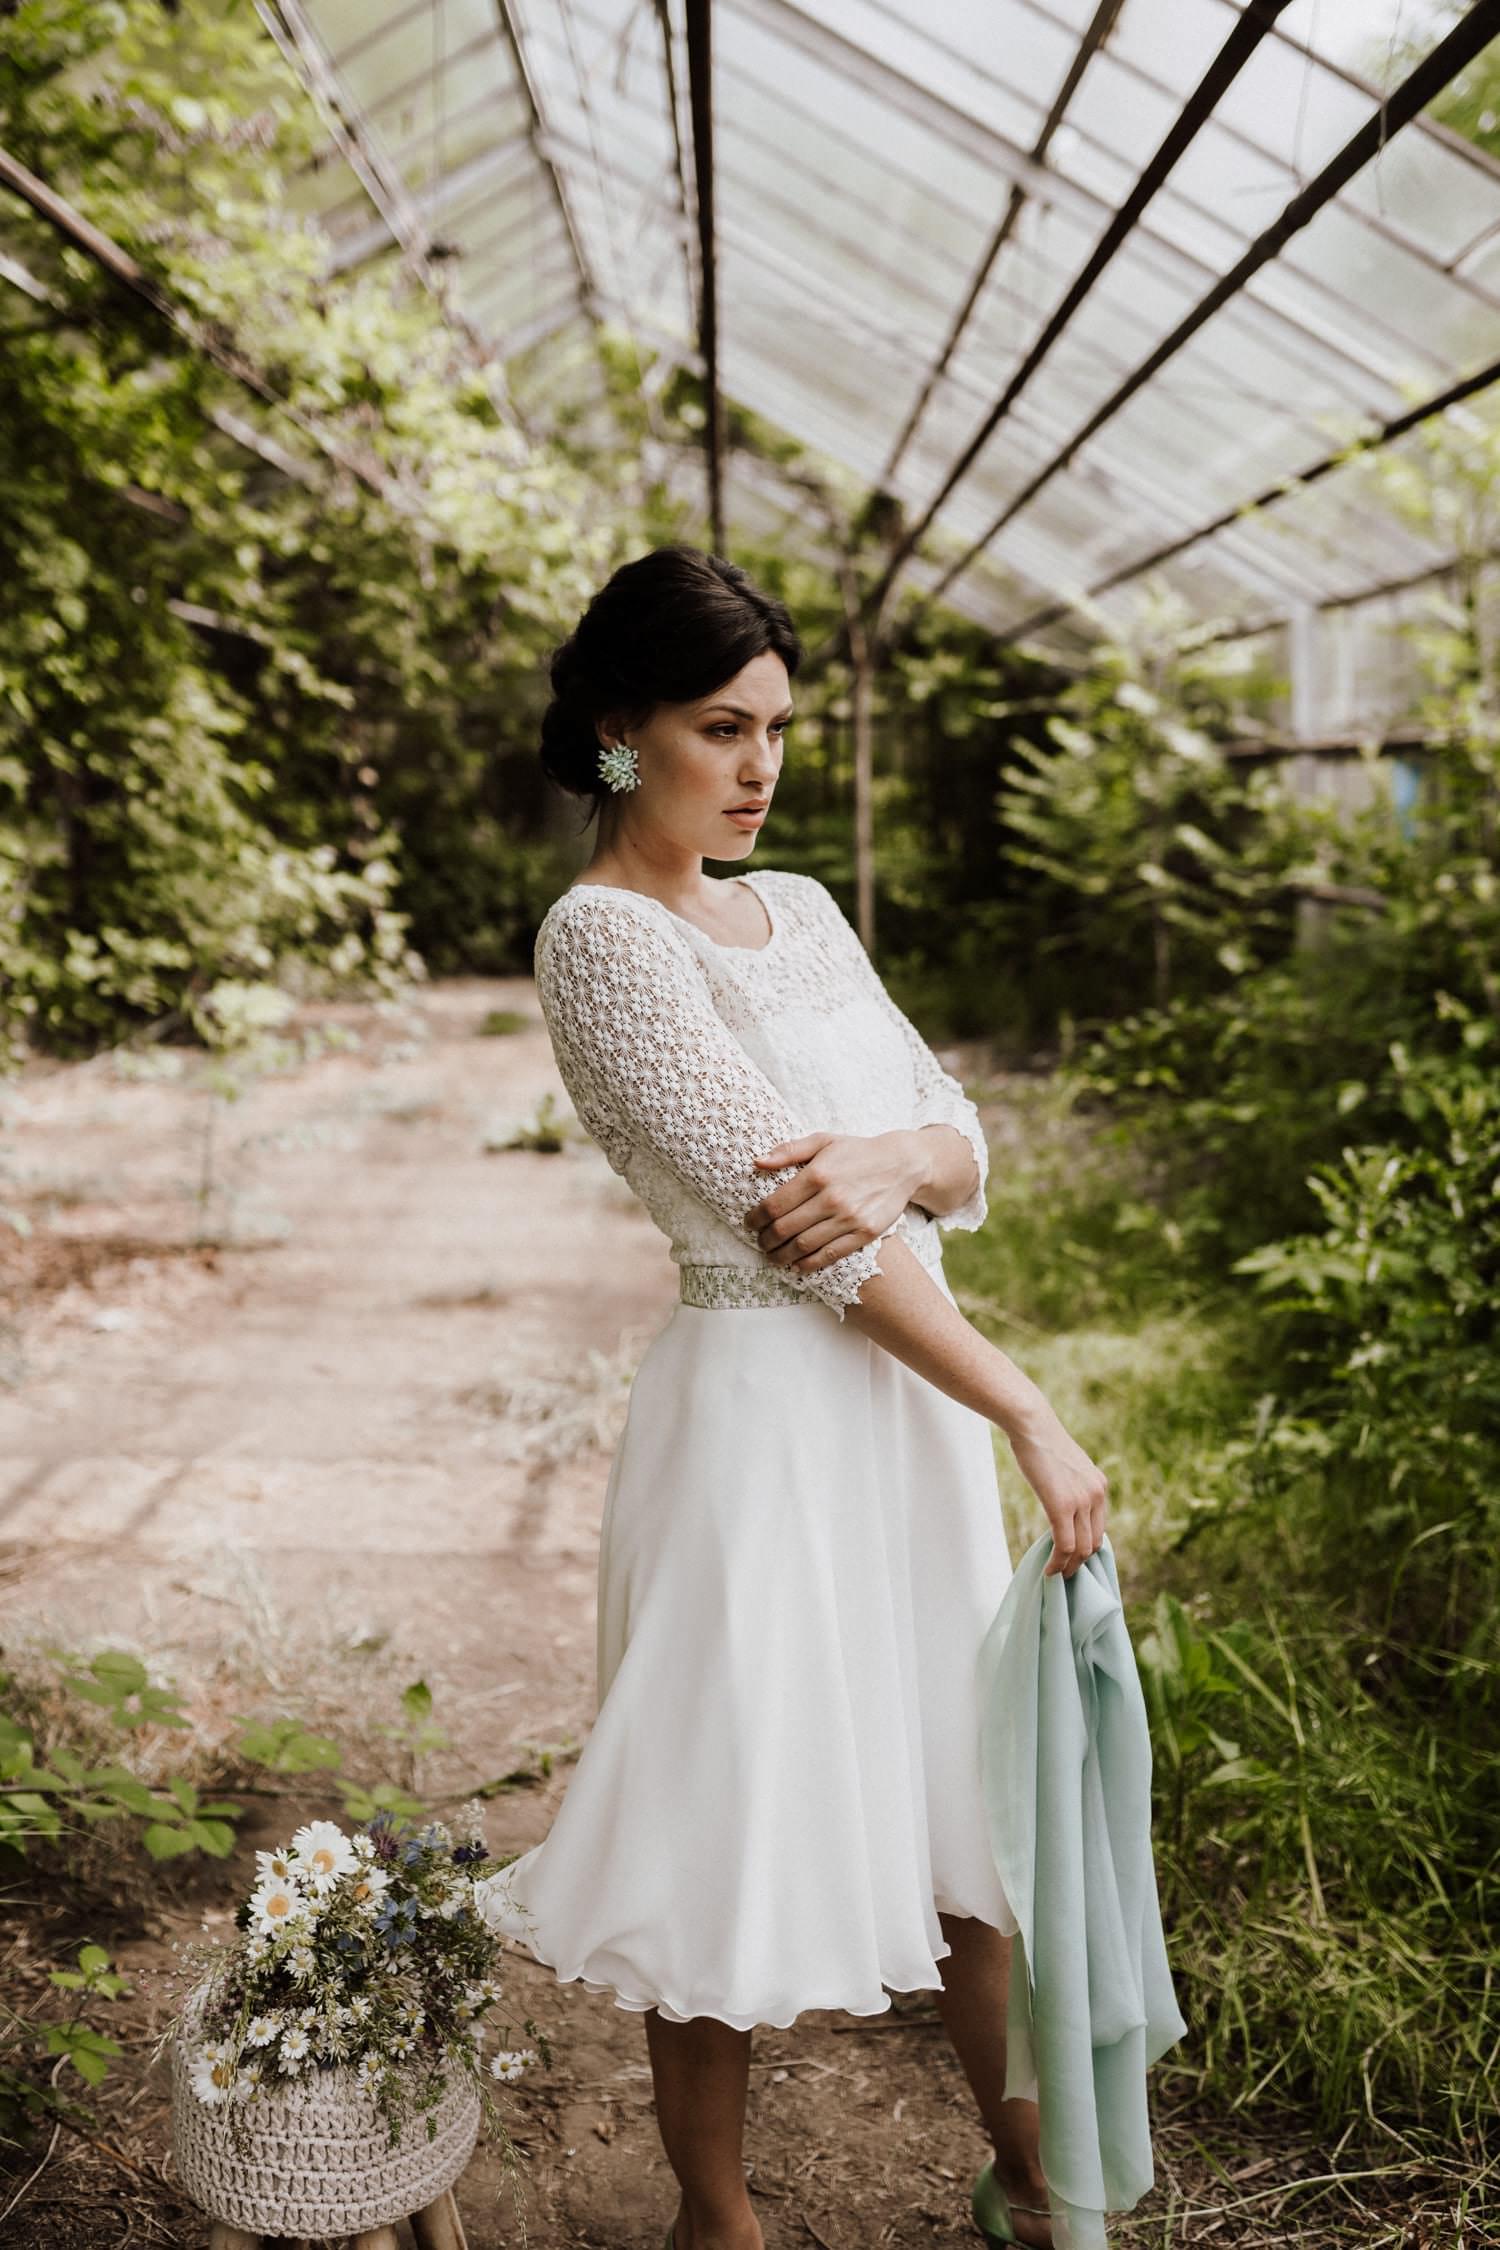 Brautkleid-kurz-Ärmel-Tellerrock